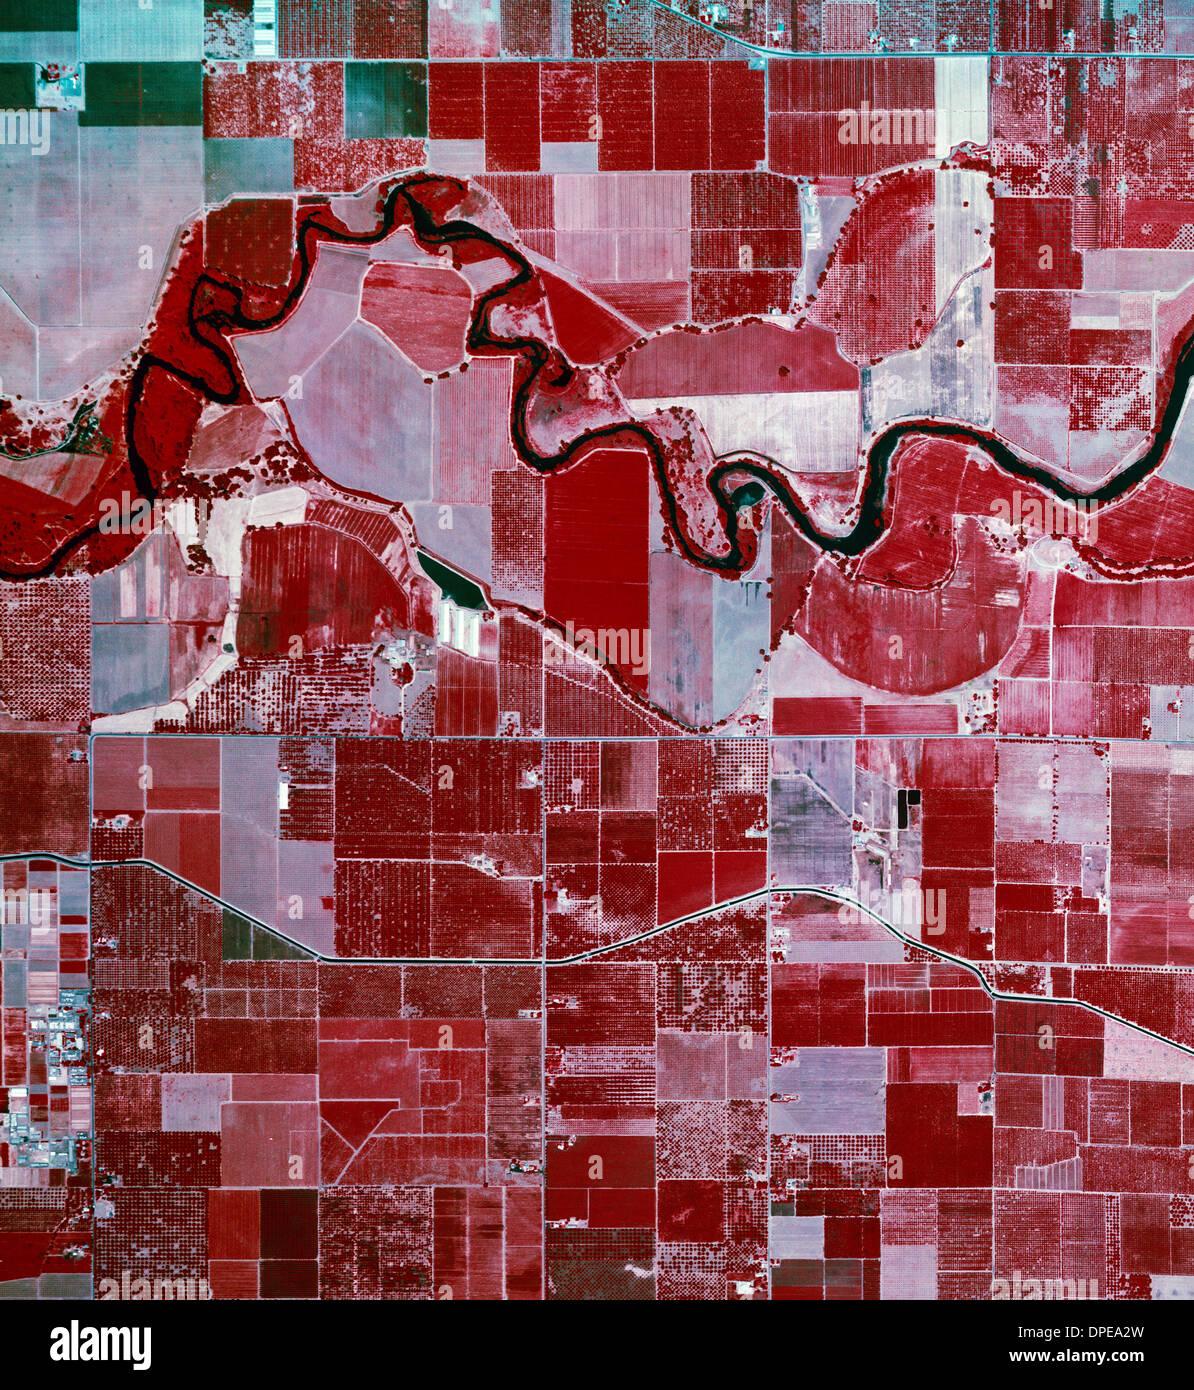 color infrared aerial photograph near Modesto, California - Stock Image